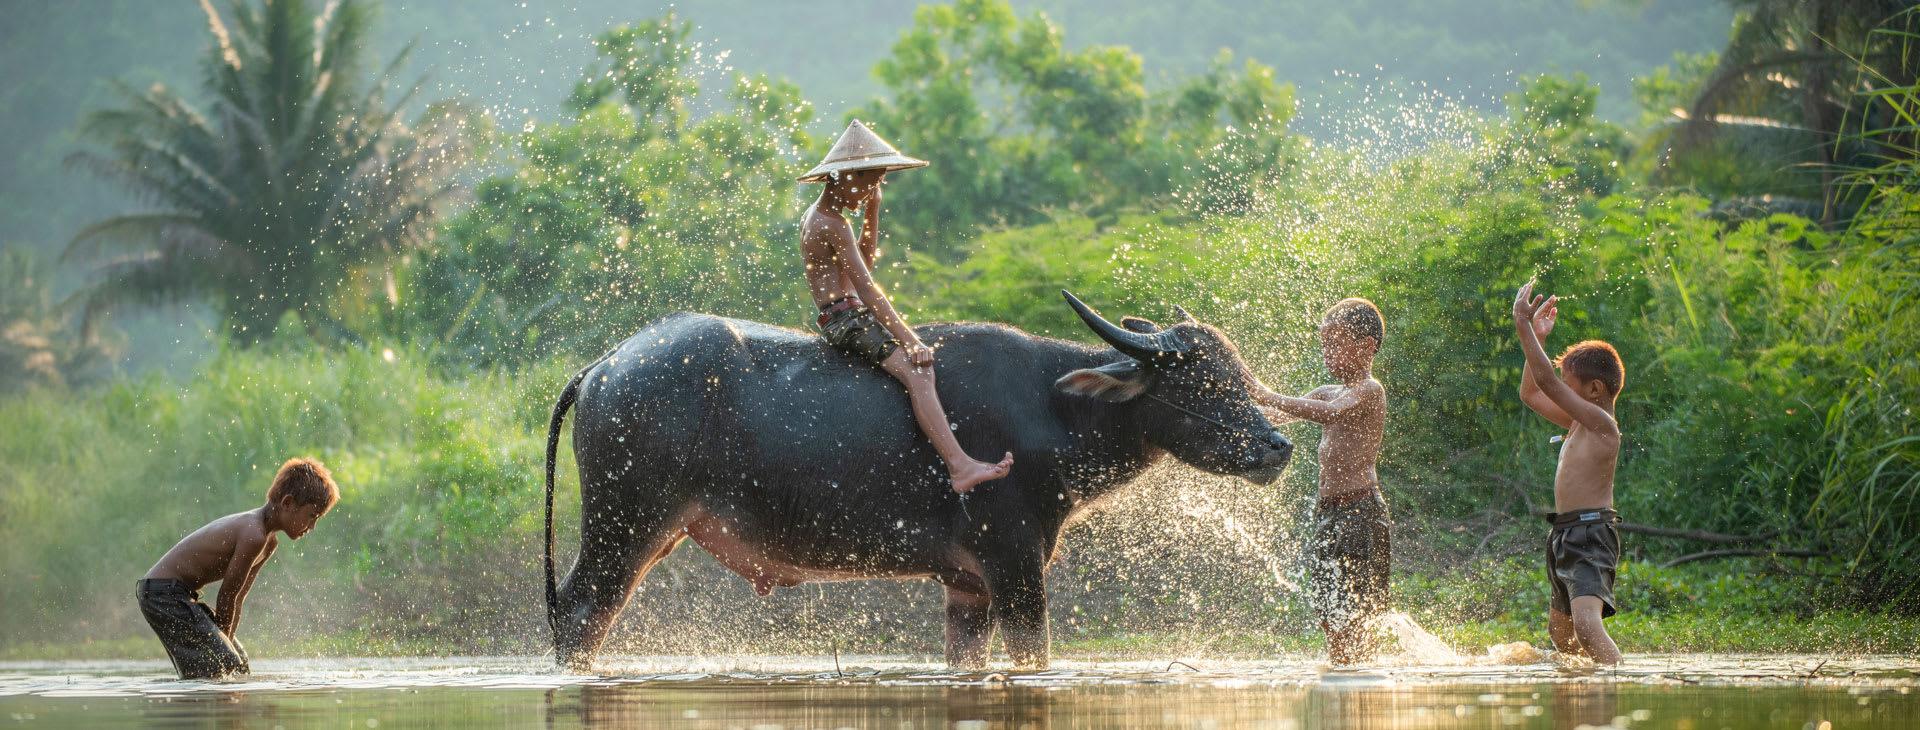 Kids playing with a water buffalo